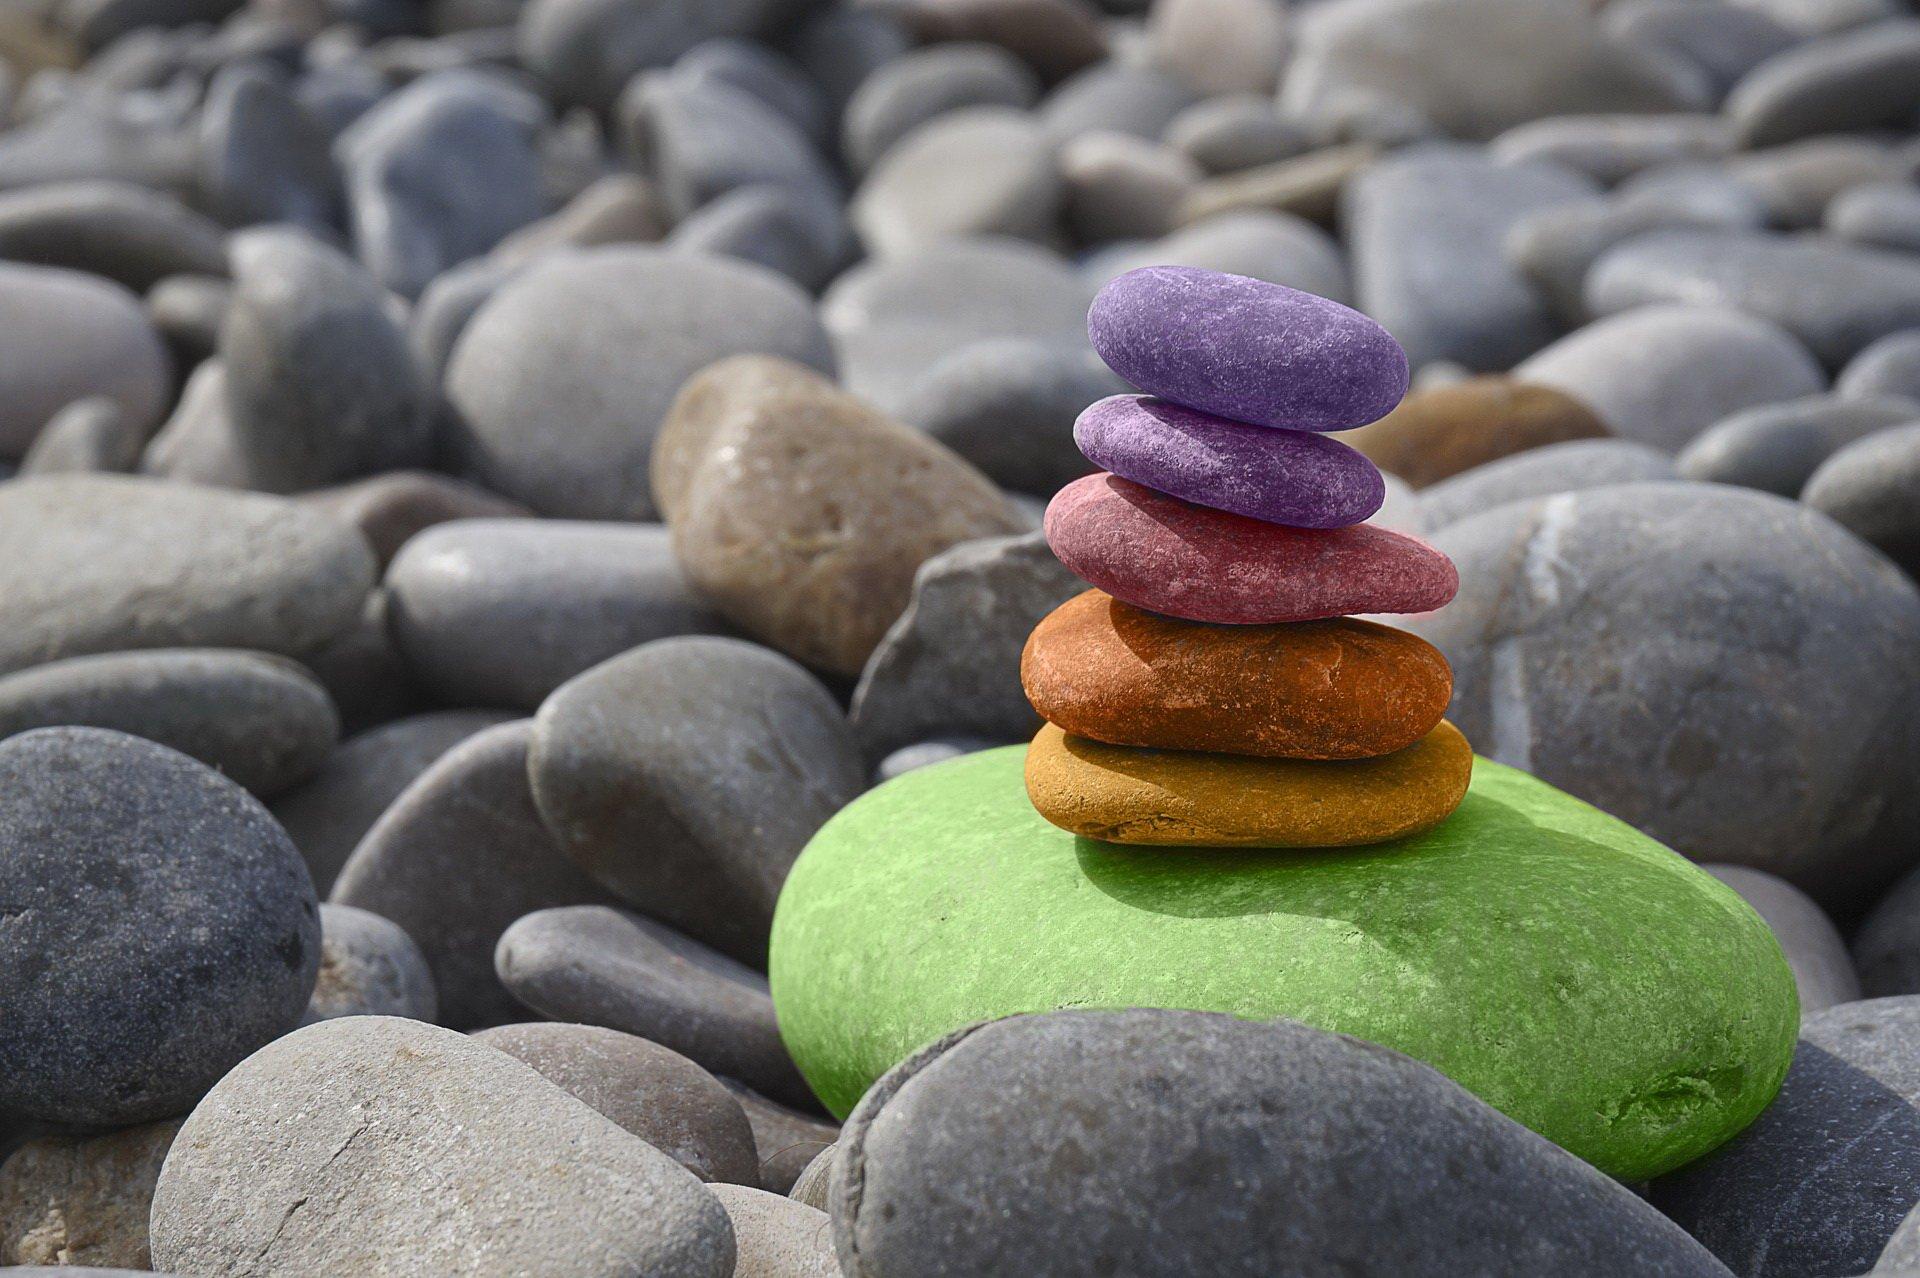 zagadka o kamieniu na inteligencje